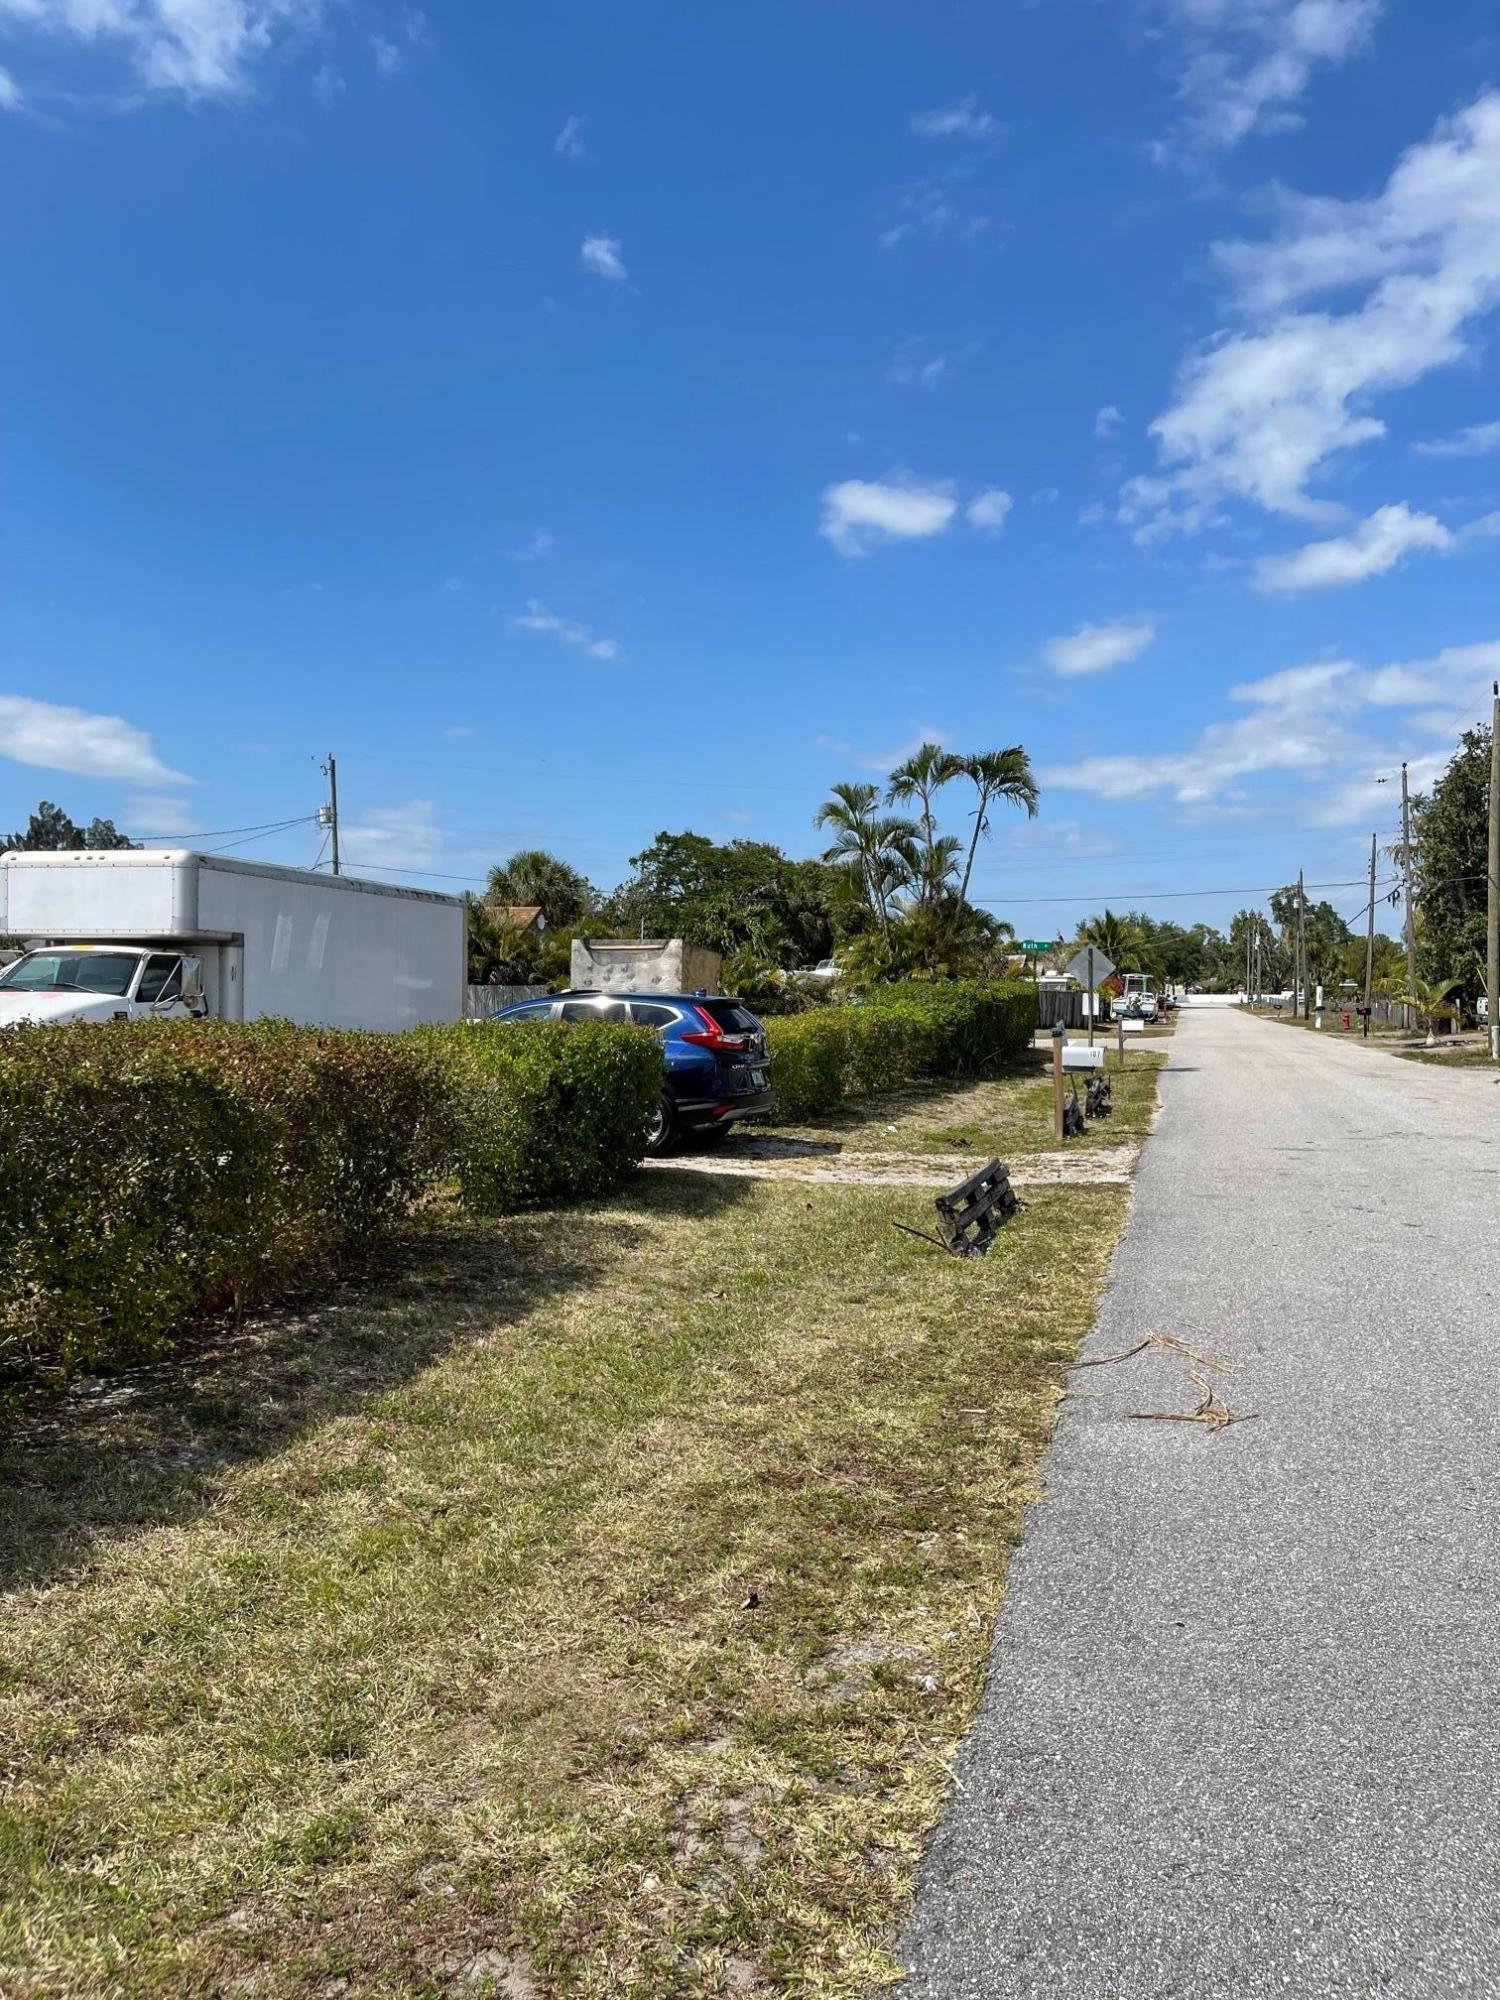 107 Neva Drive, West Palm Beach, Florida 33415, ,C,Commercial land,Neva,RX-10701566